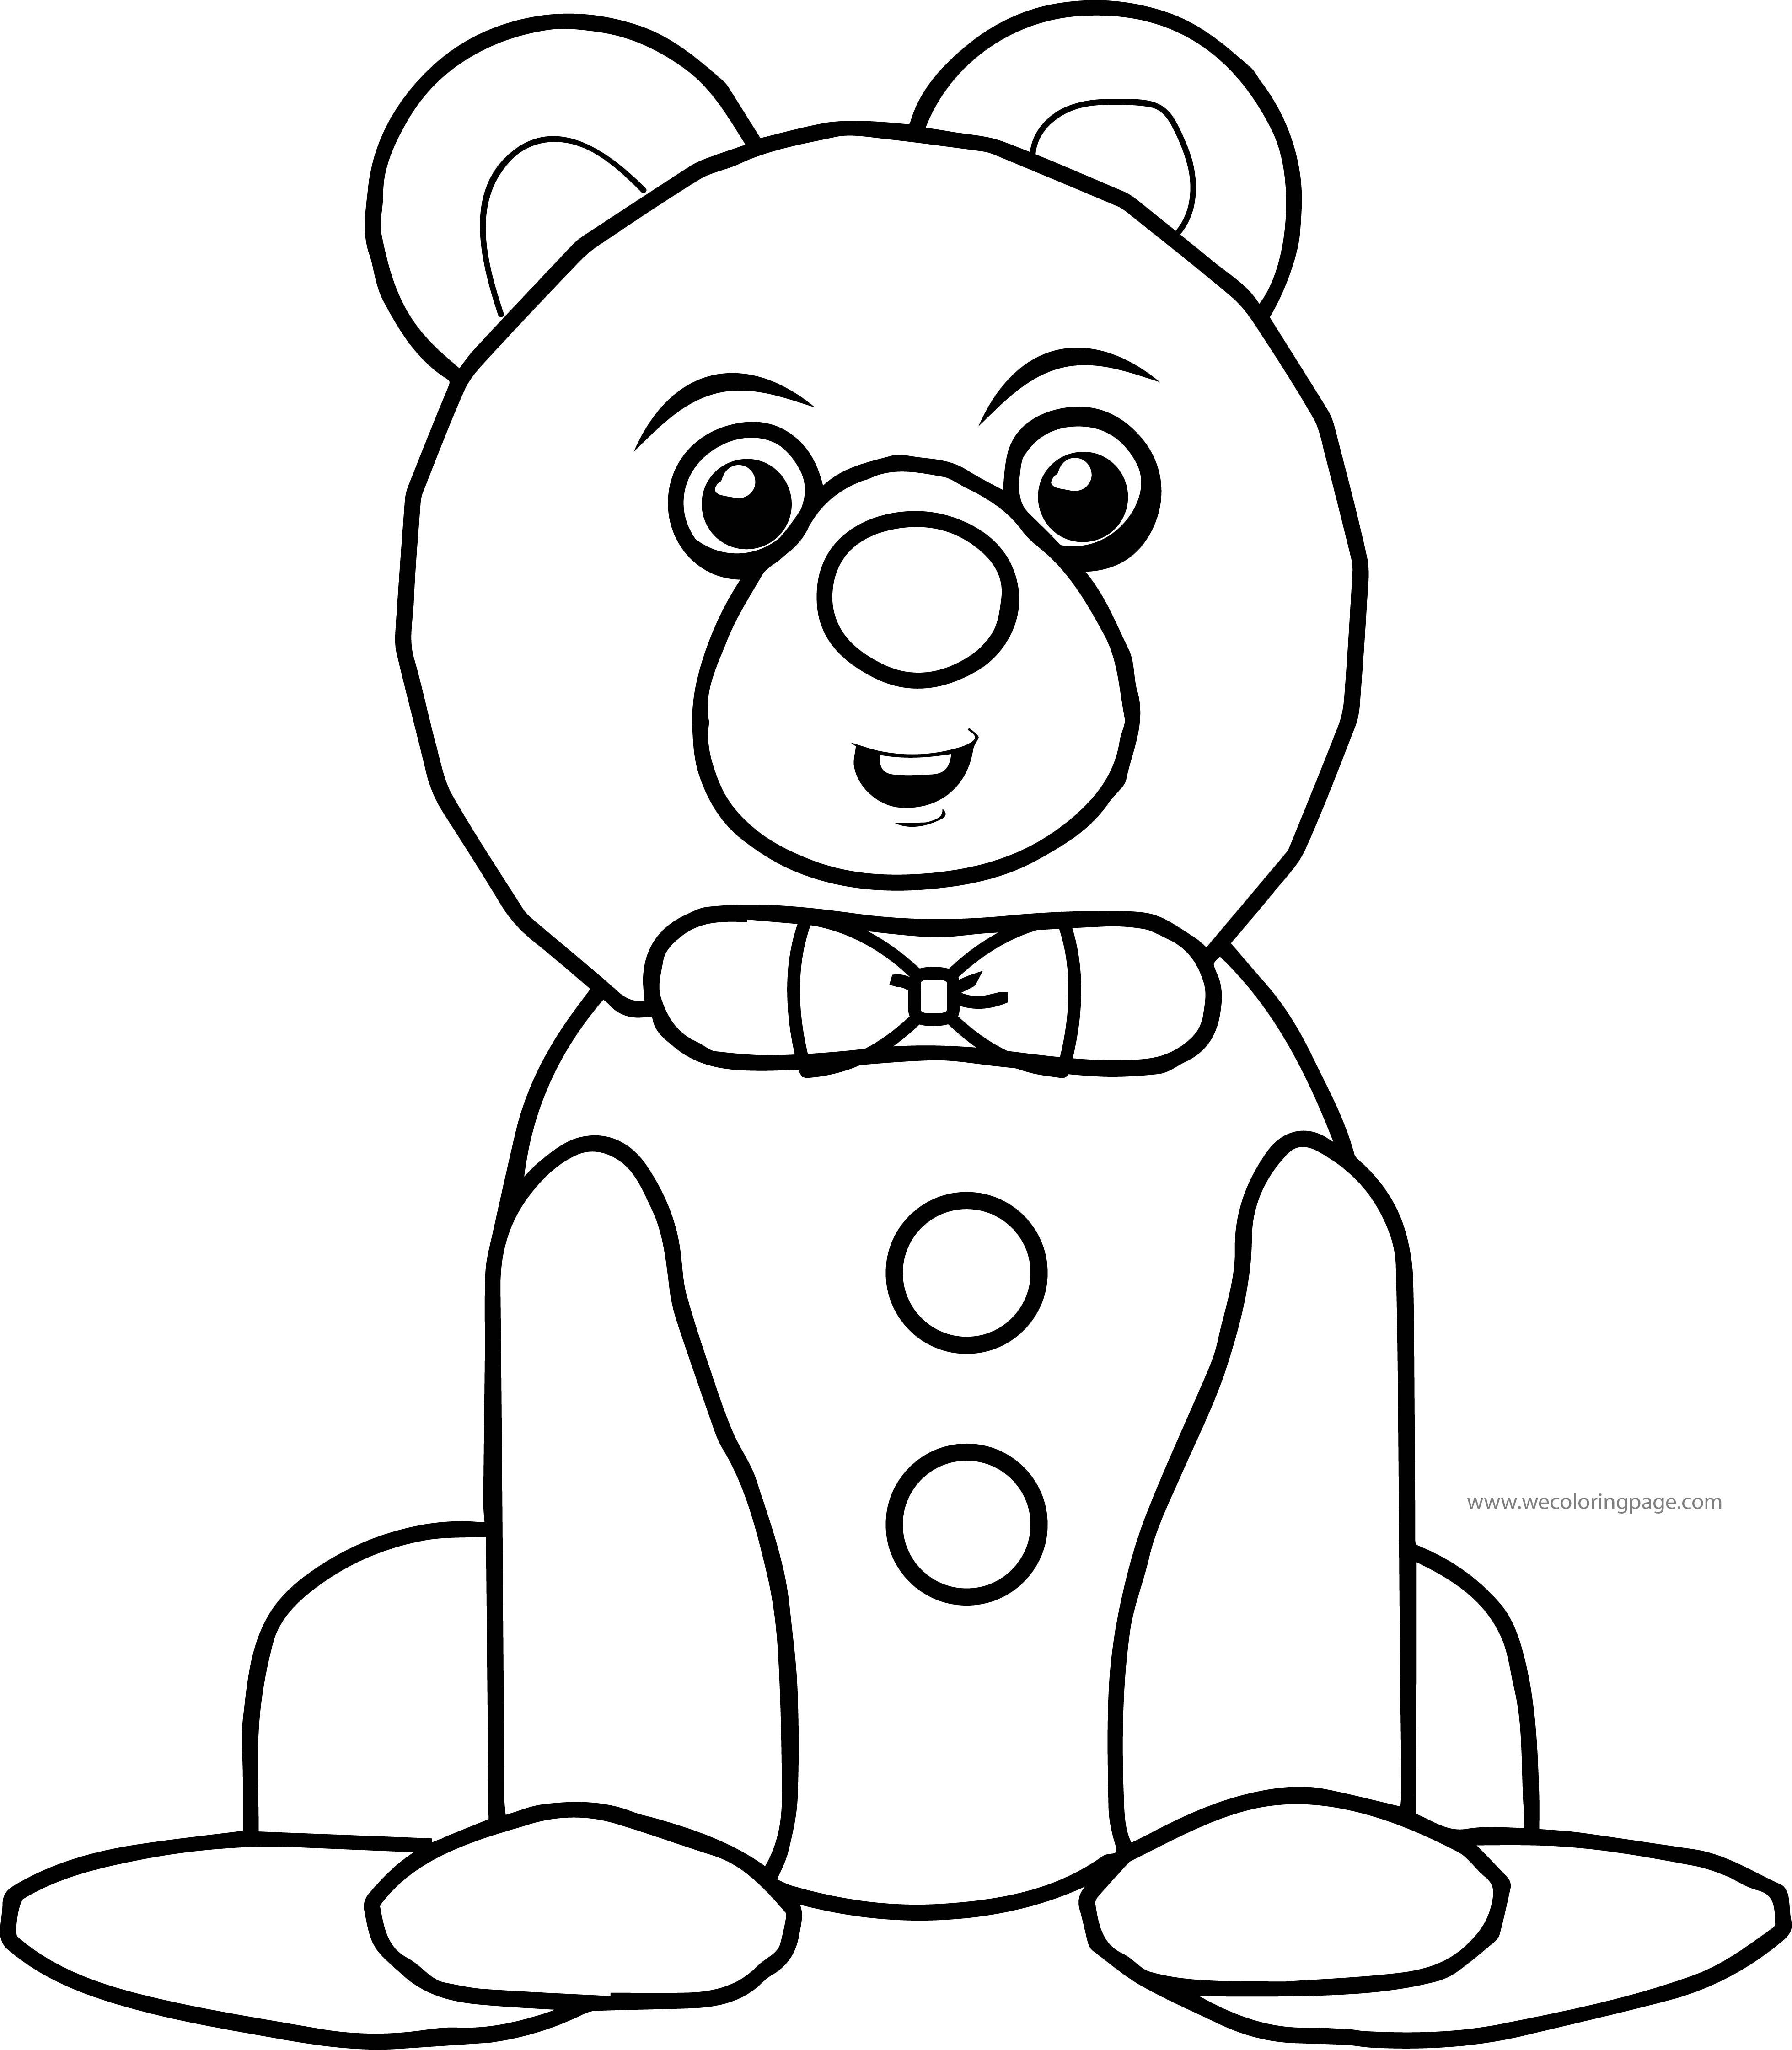 Bow Tie Bear Cartoon Coloring Page